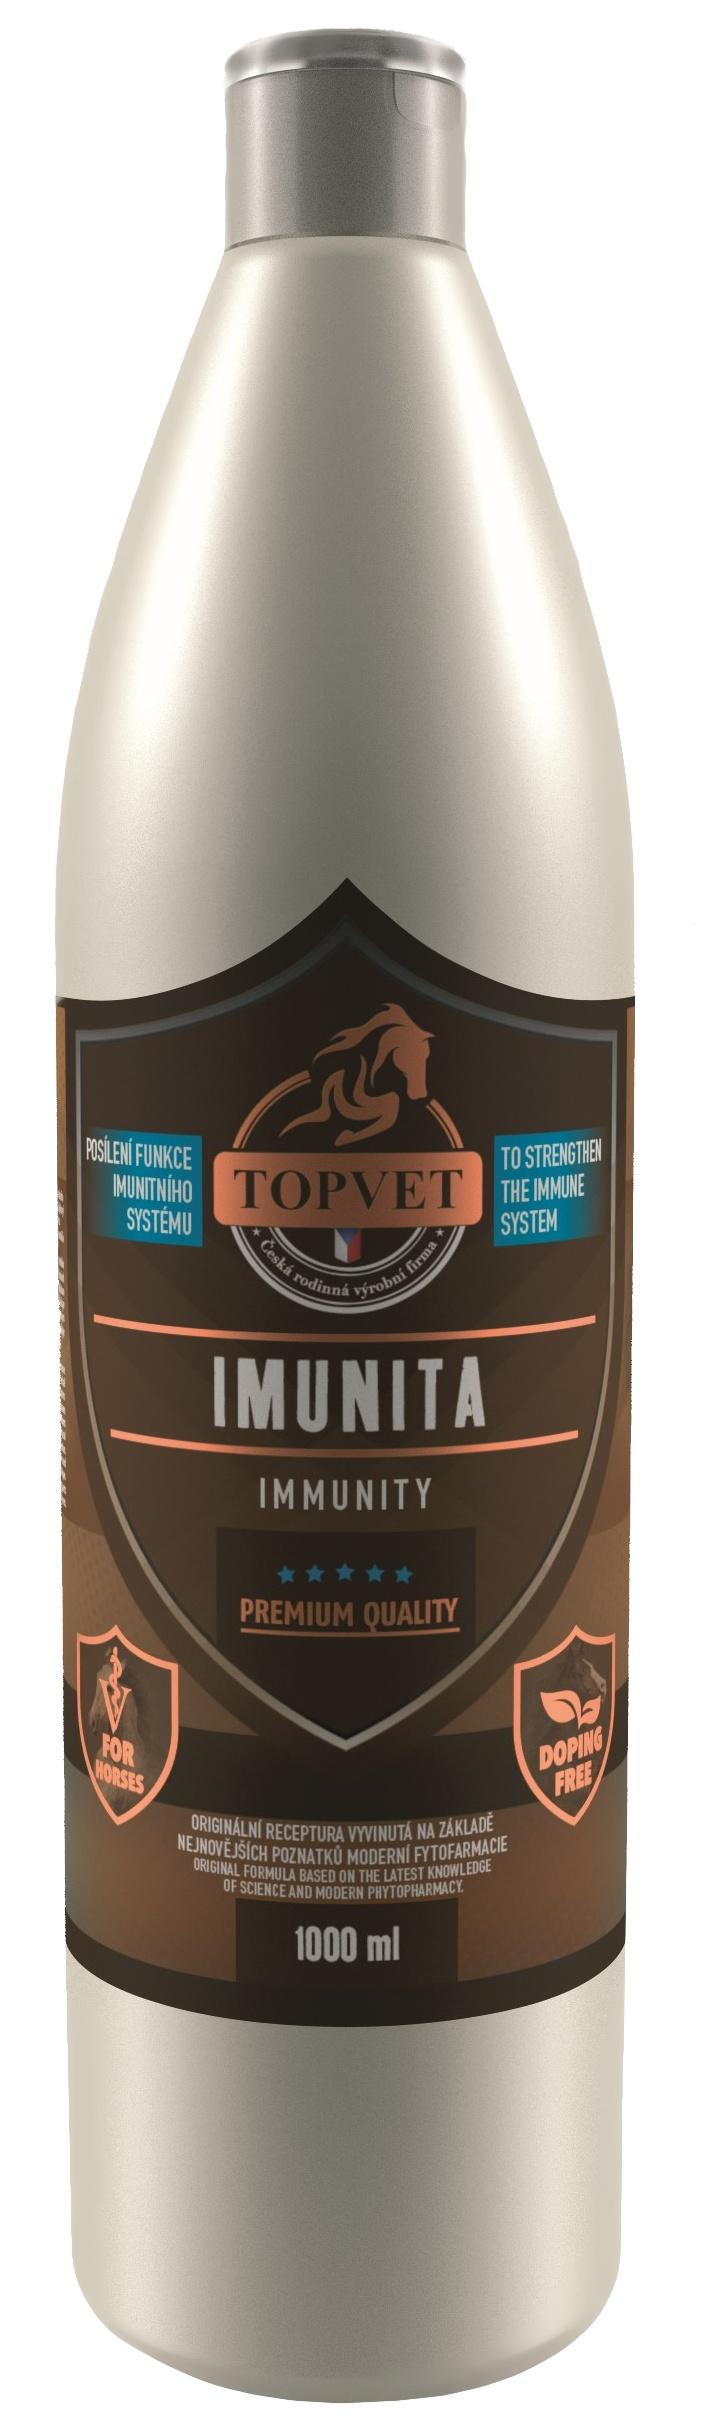 Topvet Sirup Imunita 1l